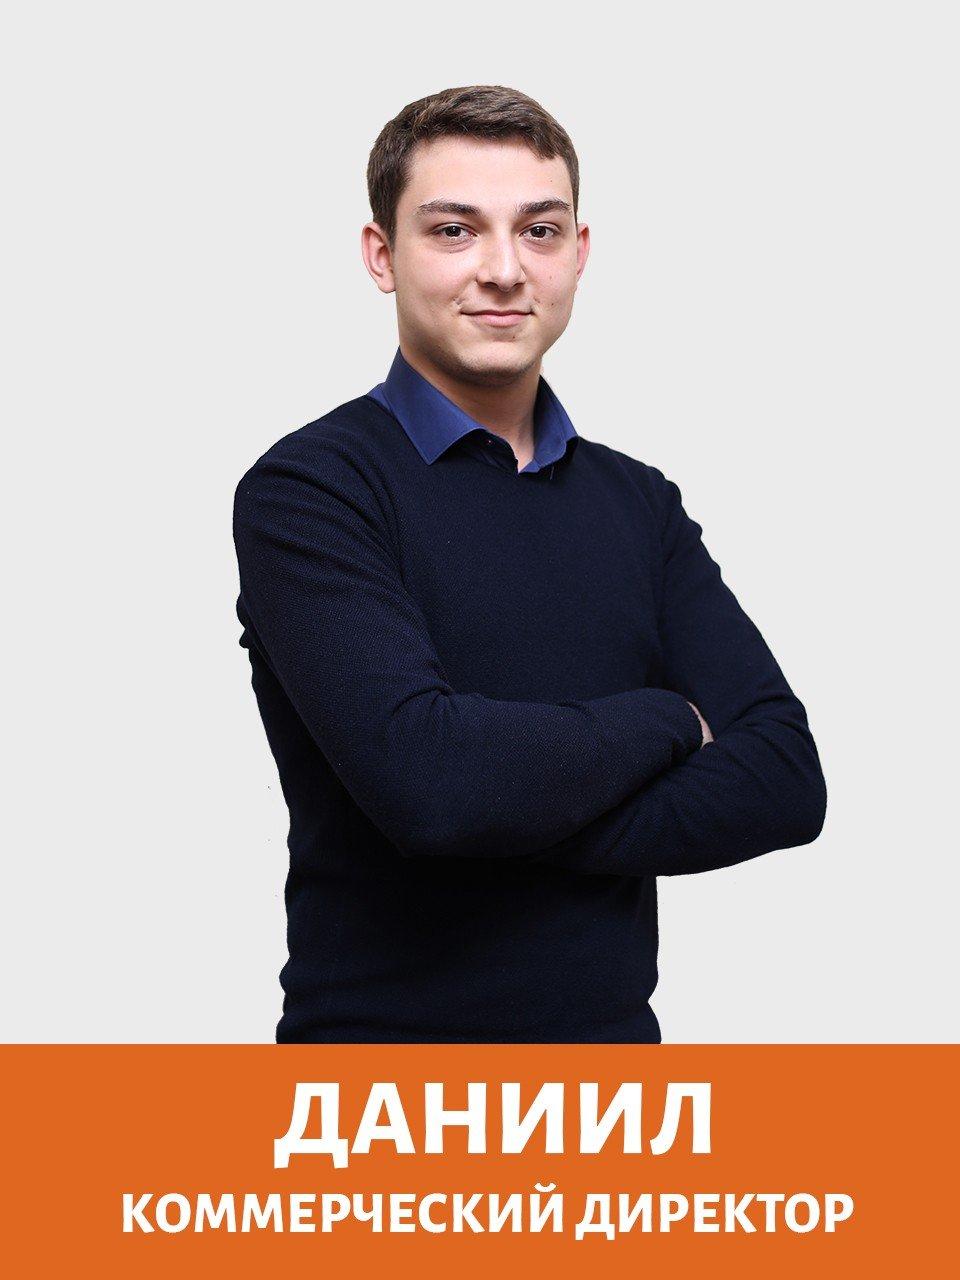 daniil direktor1 - Сделать сайт